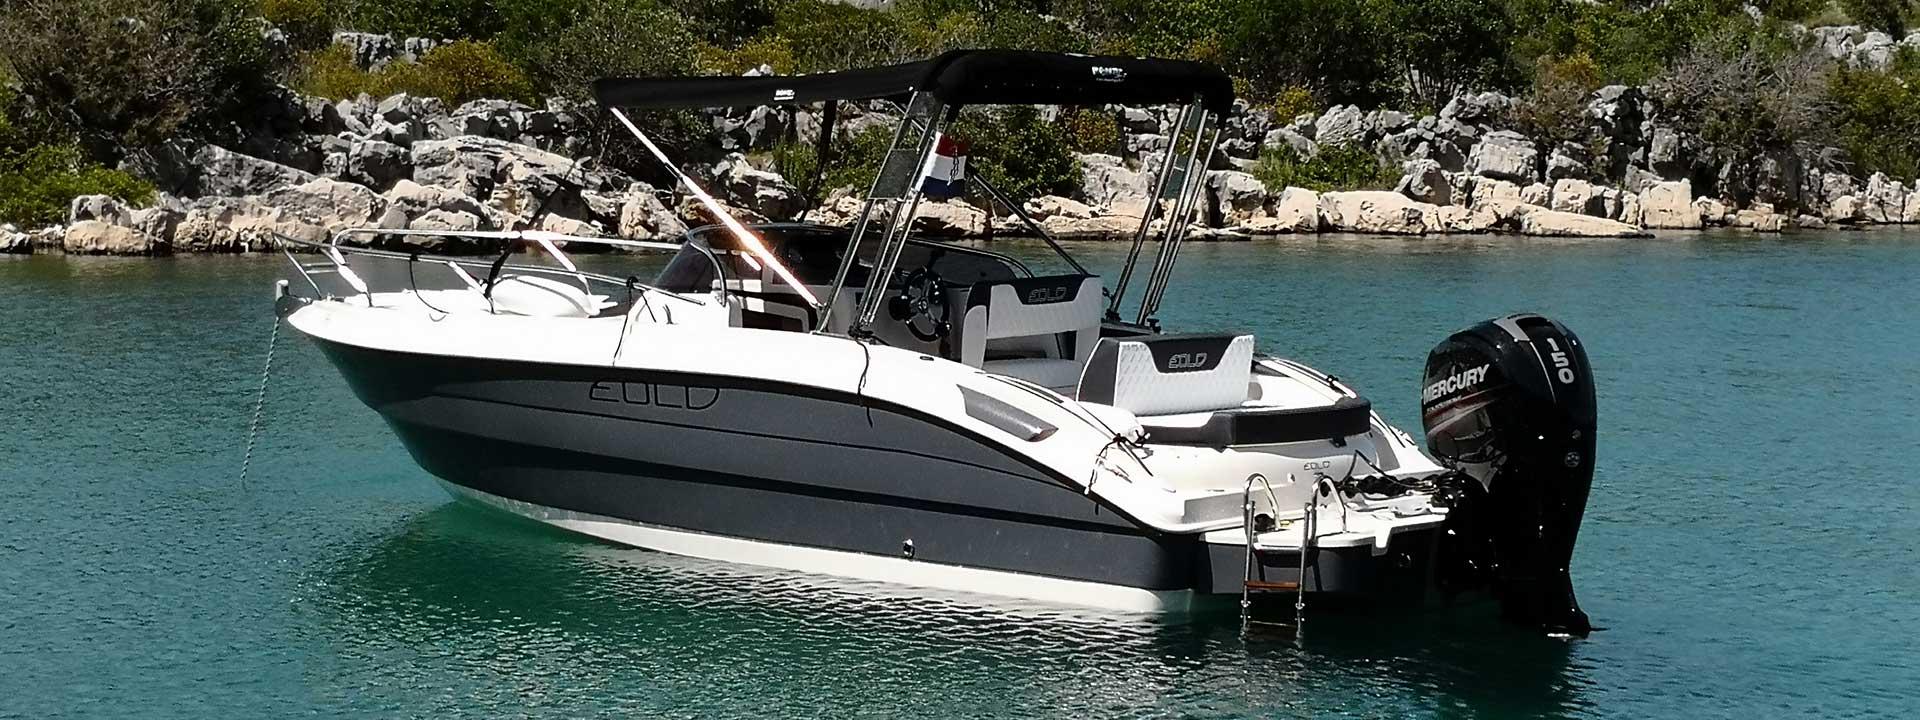 mayer-charter-boat-header-eolo-730-day-02